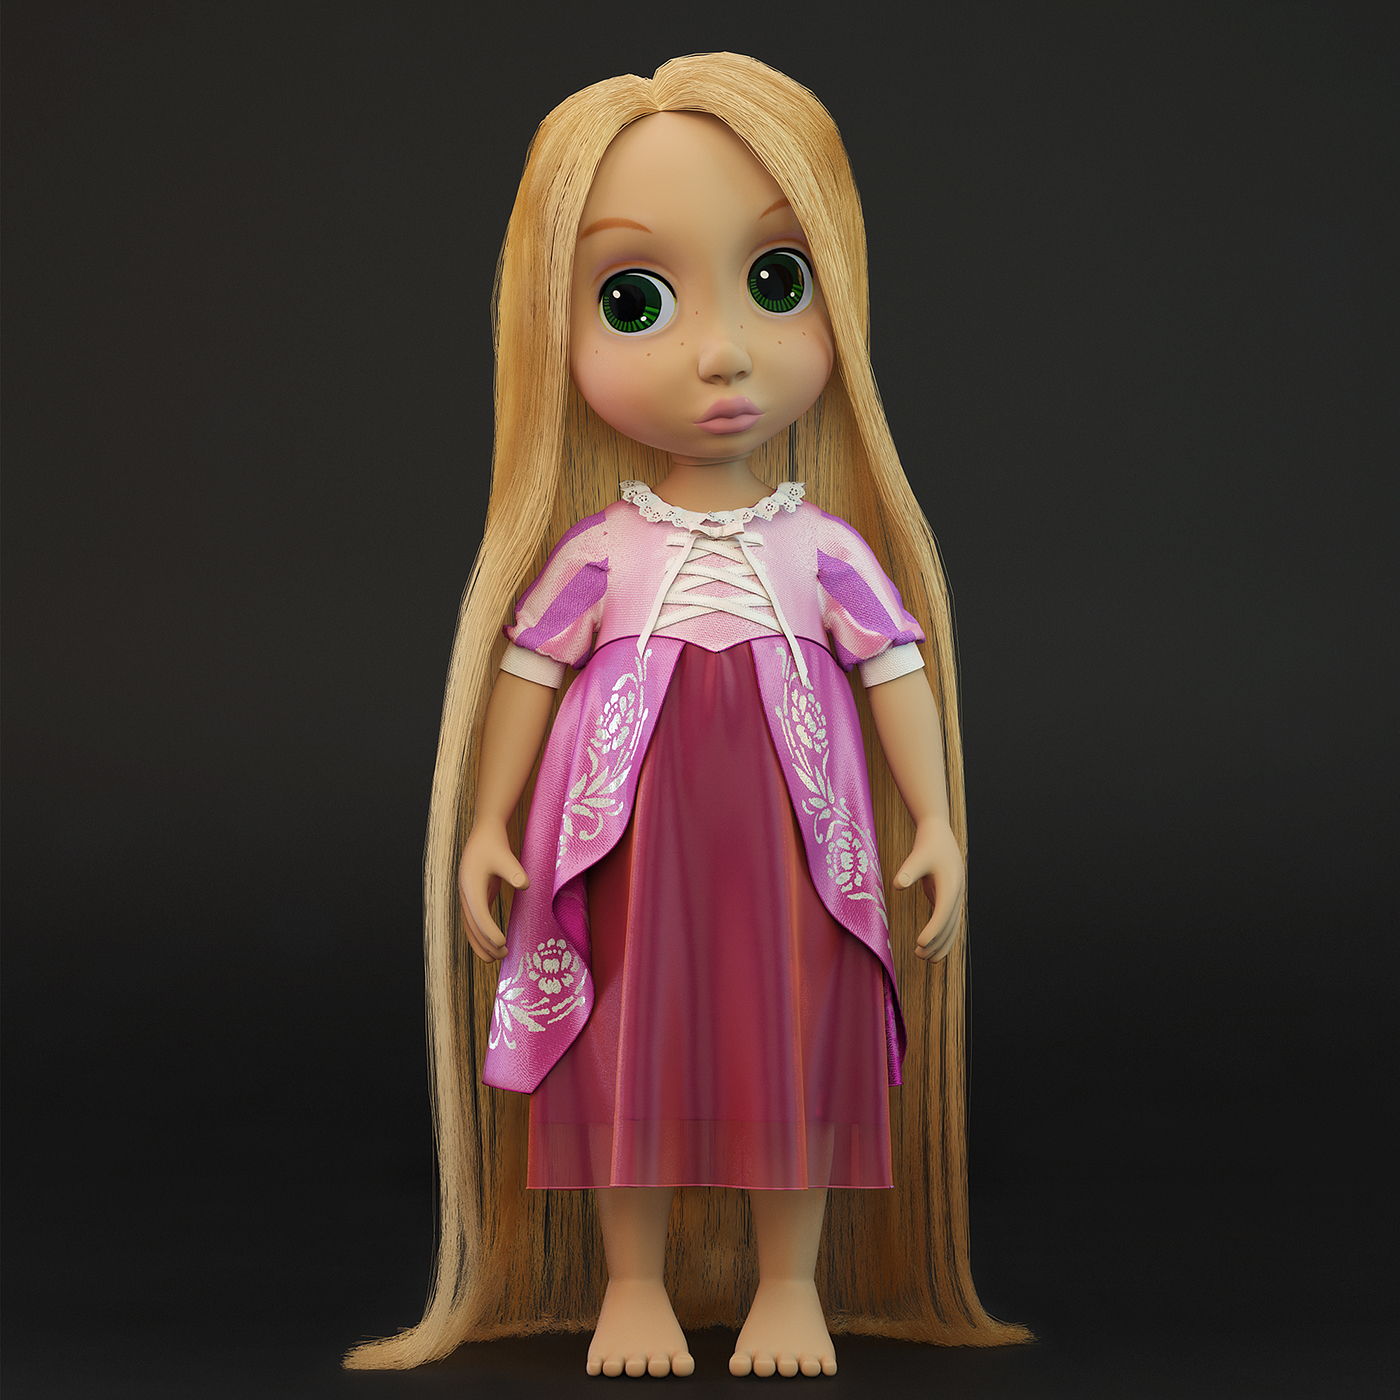 3d Model Of Rapunzel Doll On Behance